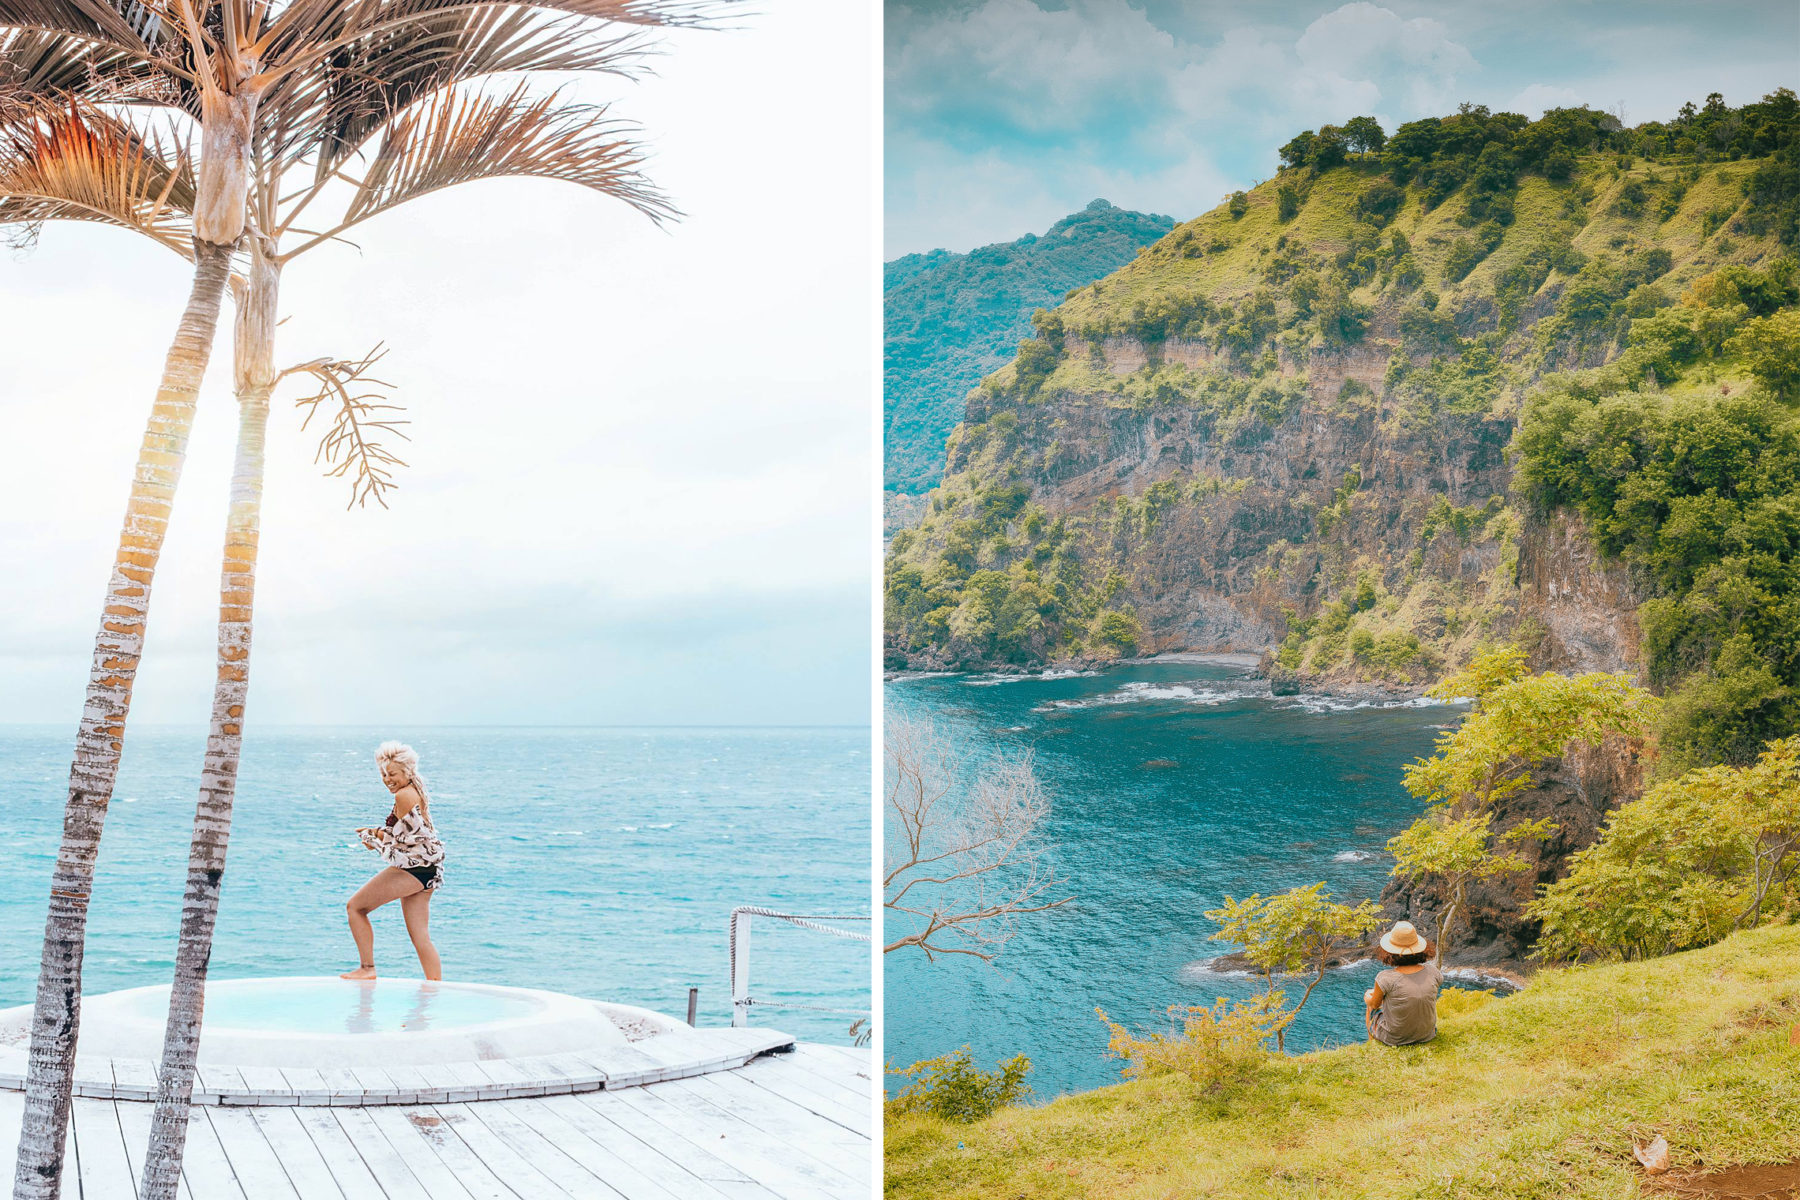 bali indonesia beach views cliffs jacuzzi spa day